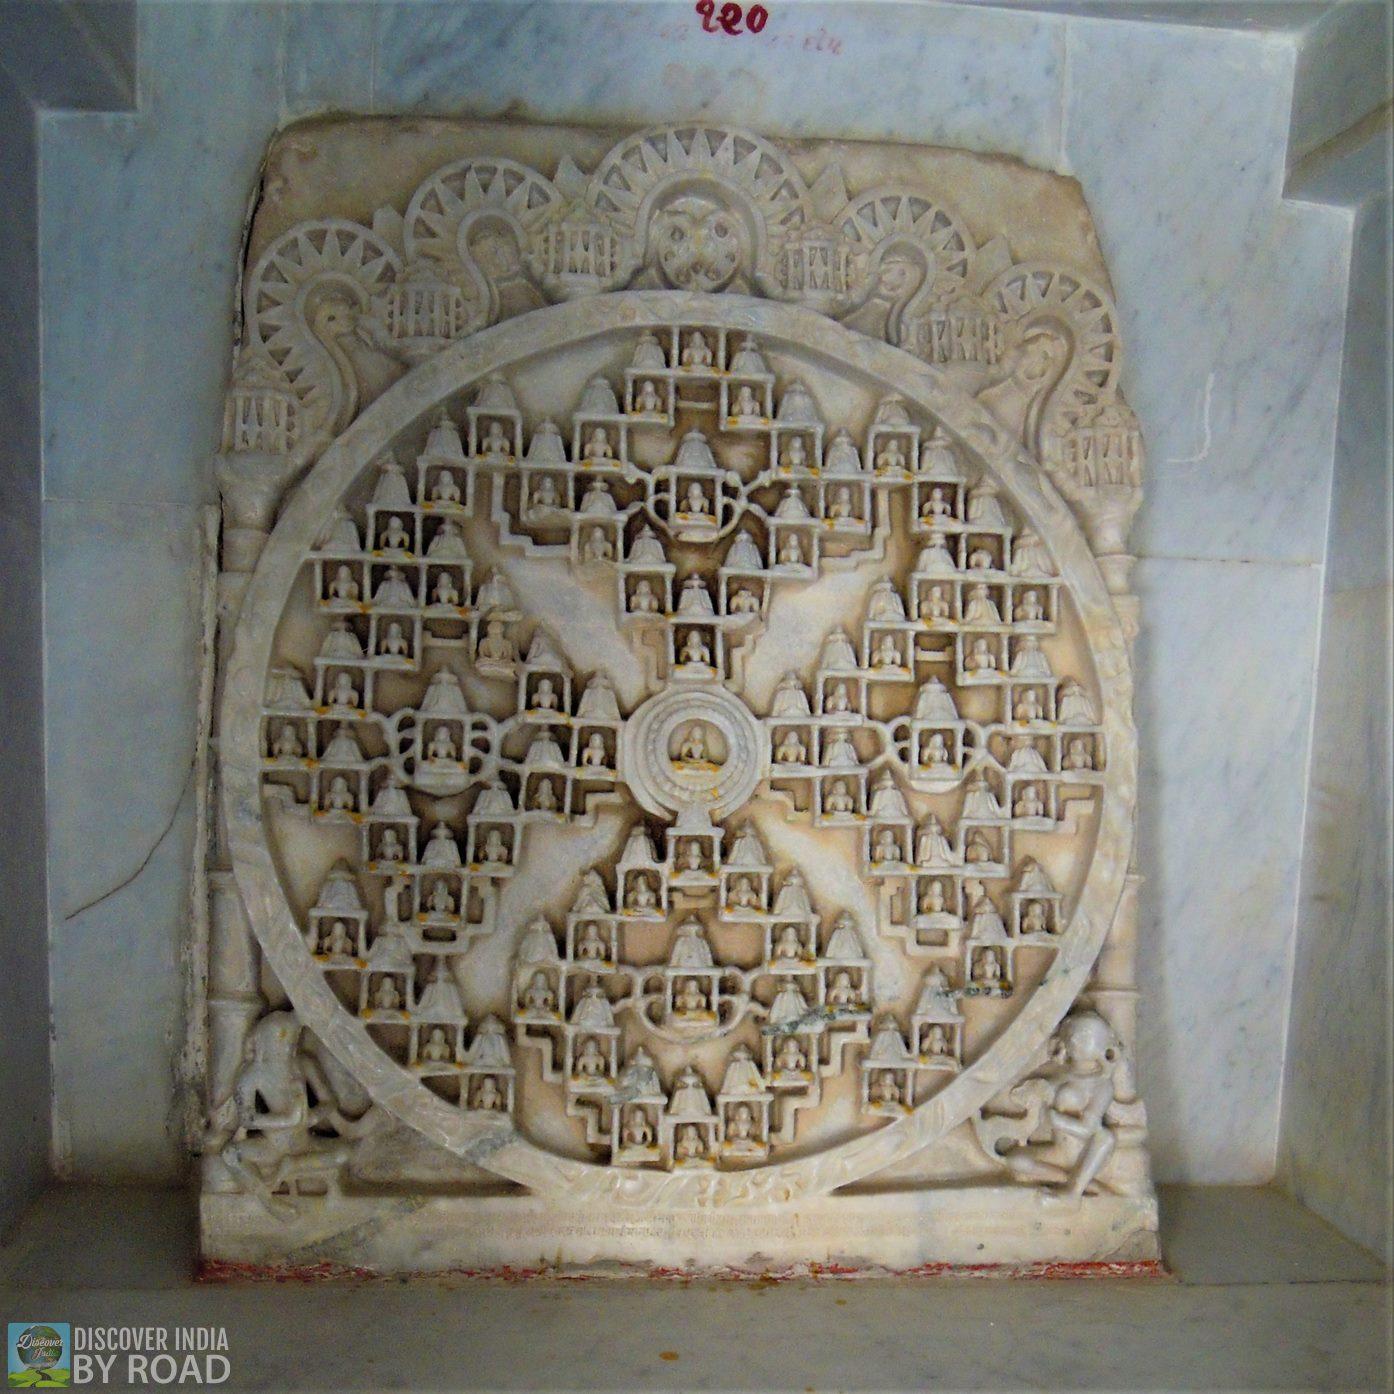 Stone structure inside Neminath Jain Temple